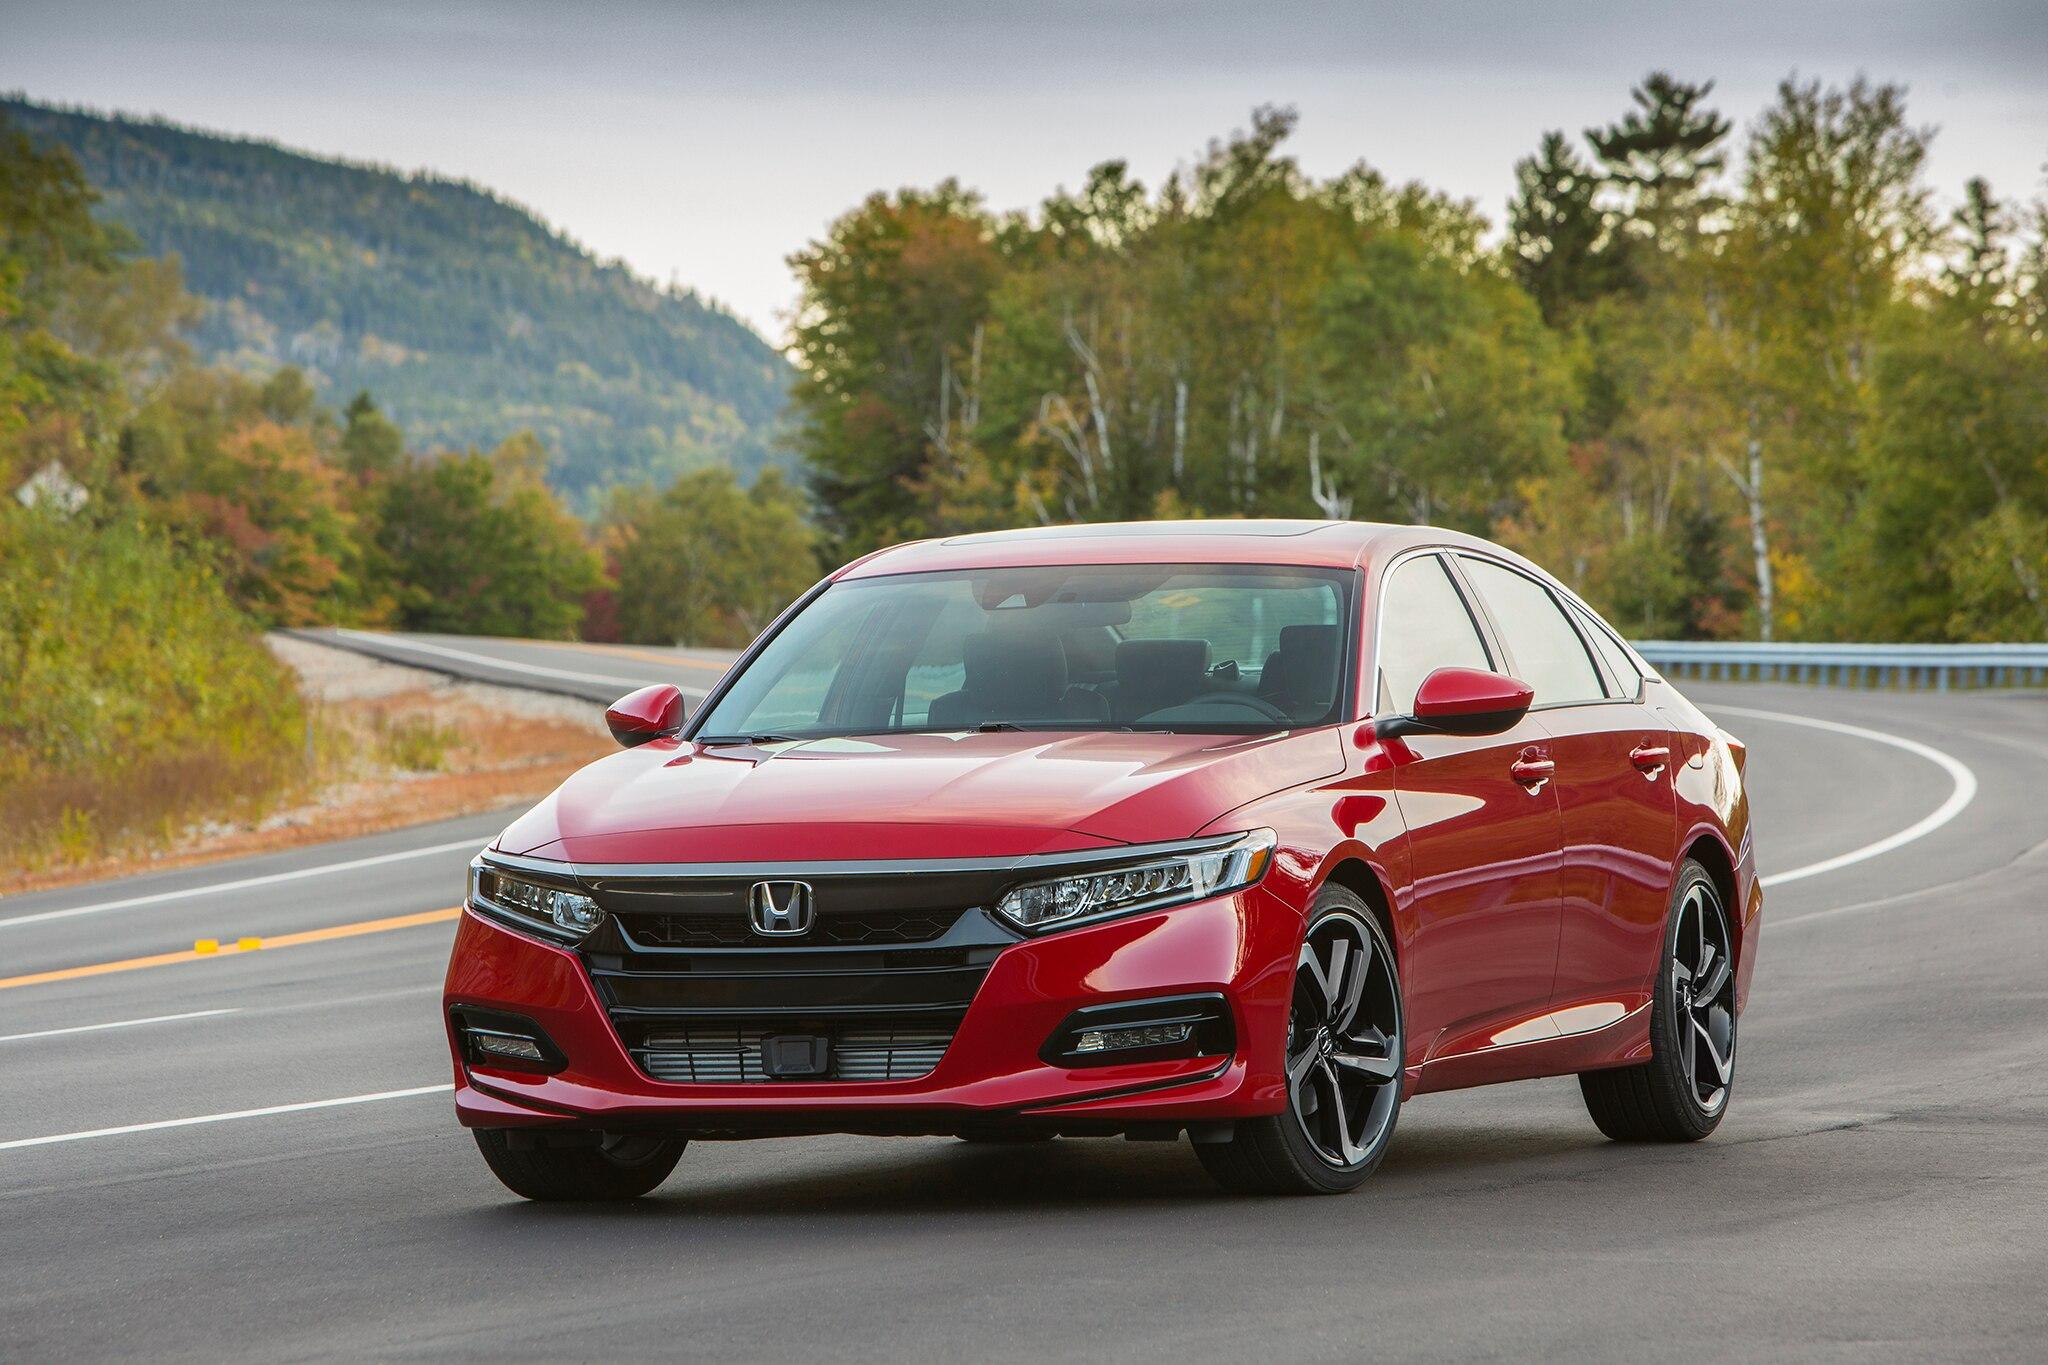 First Drive: 2018 Honda Accord   Automobile Magazine